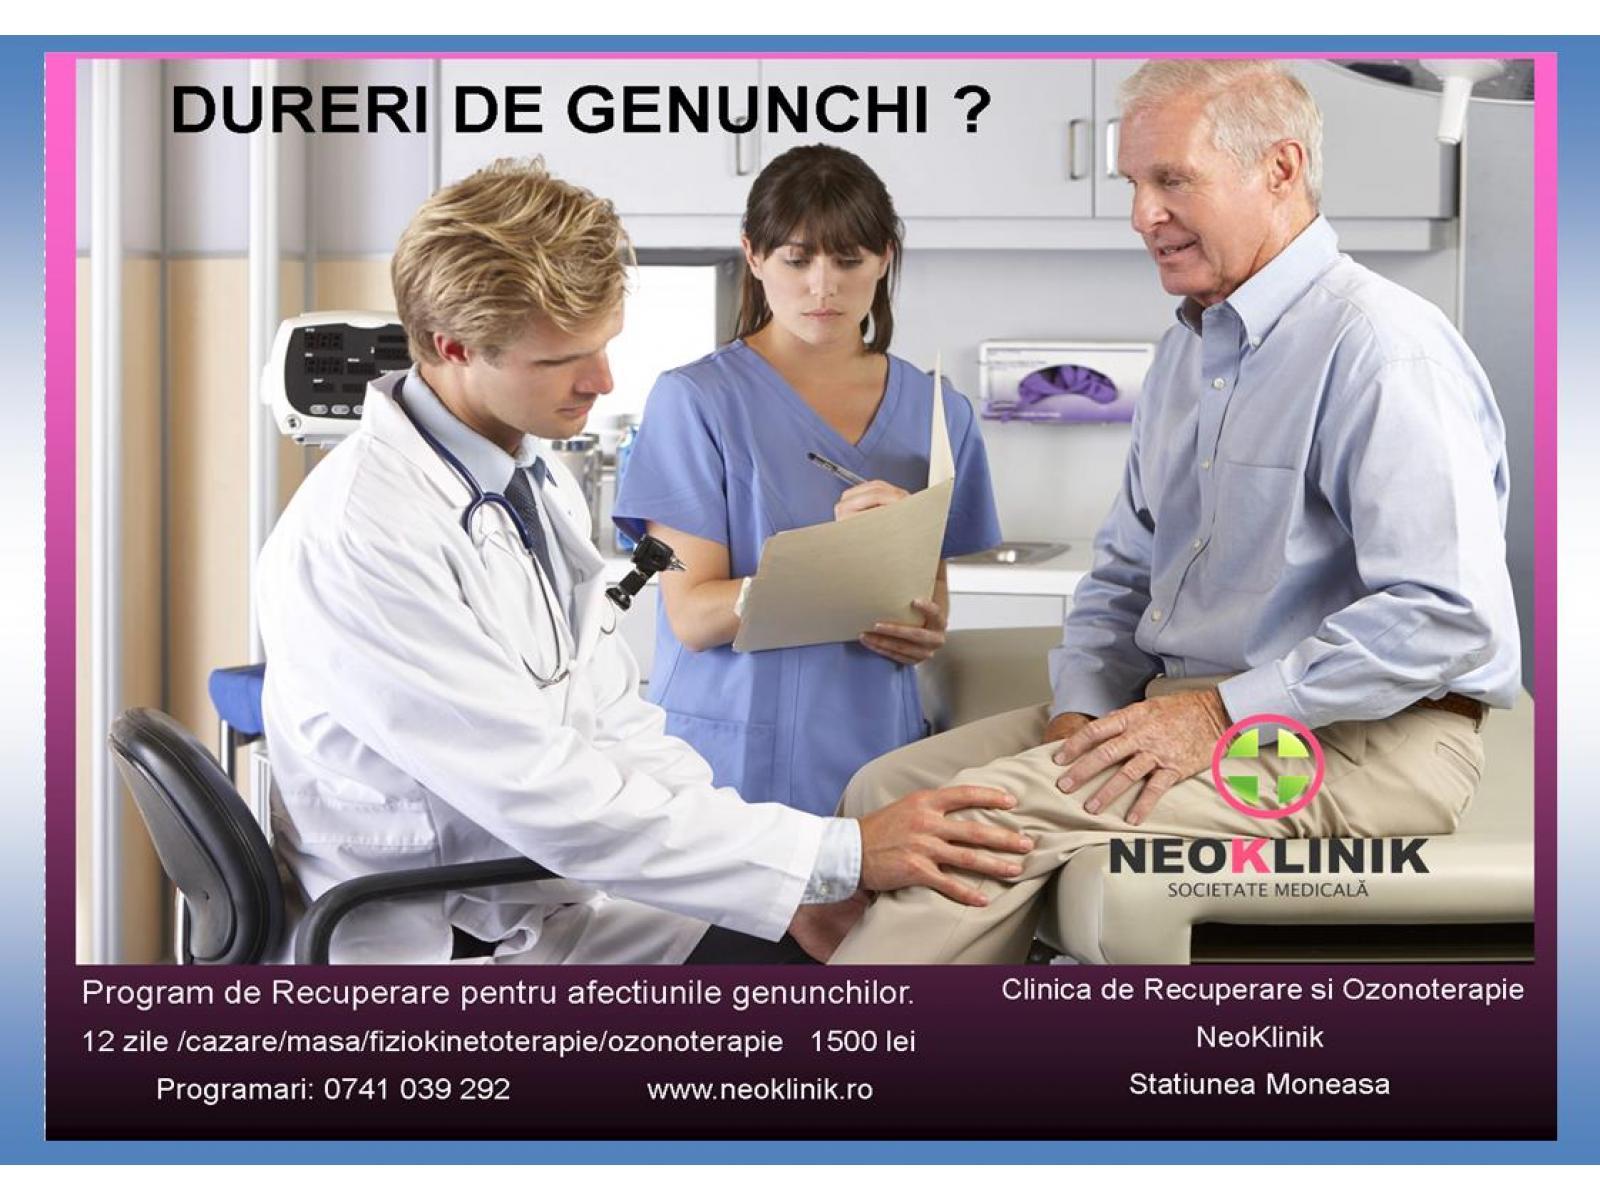 NeoKlinik - Dureri_de_genunchi.jpg